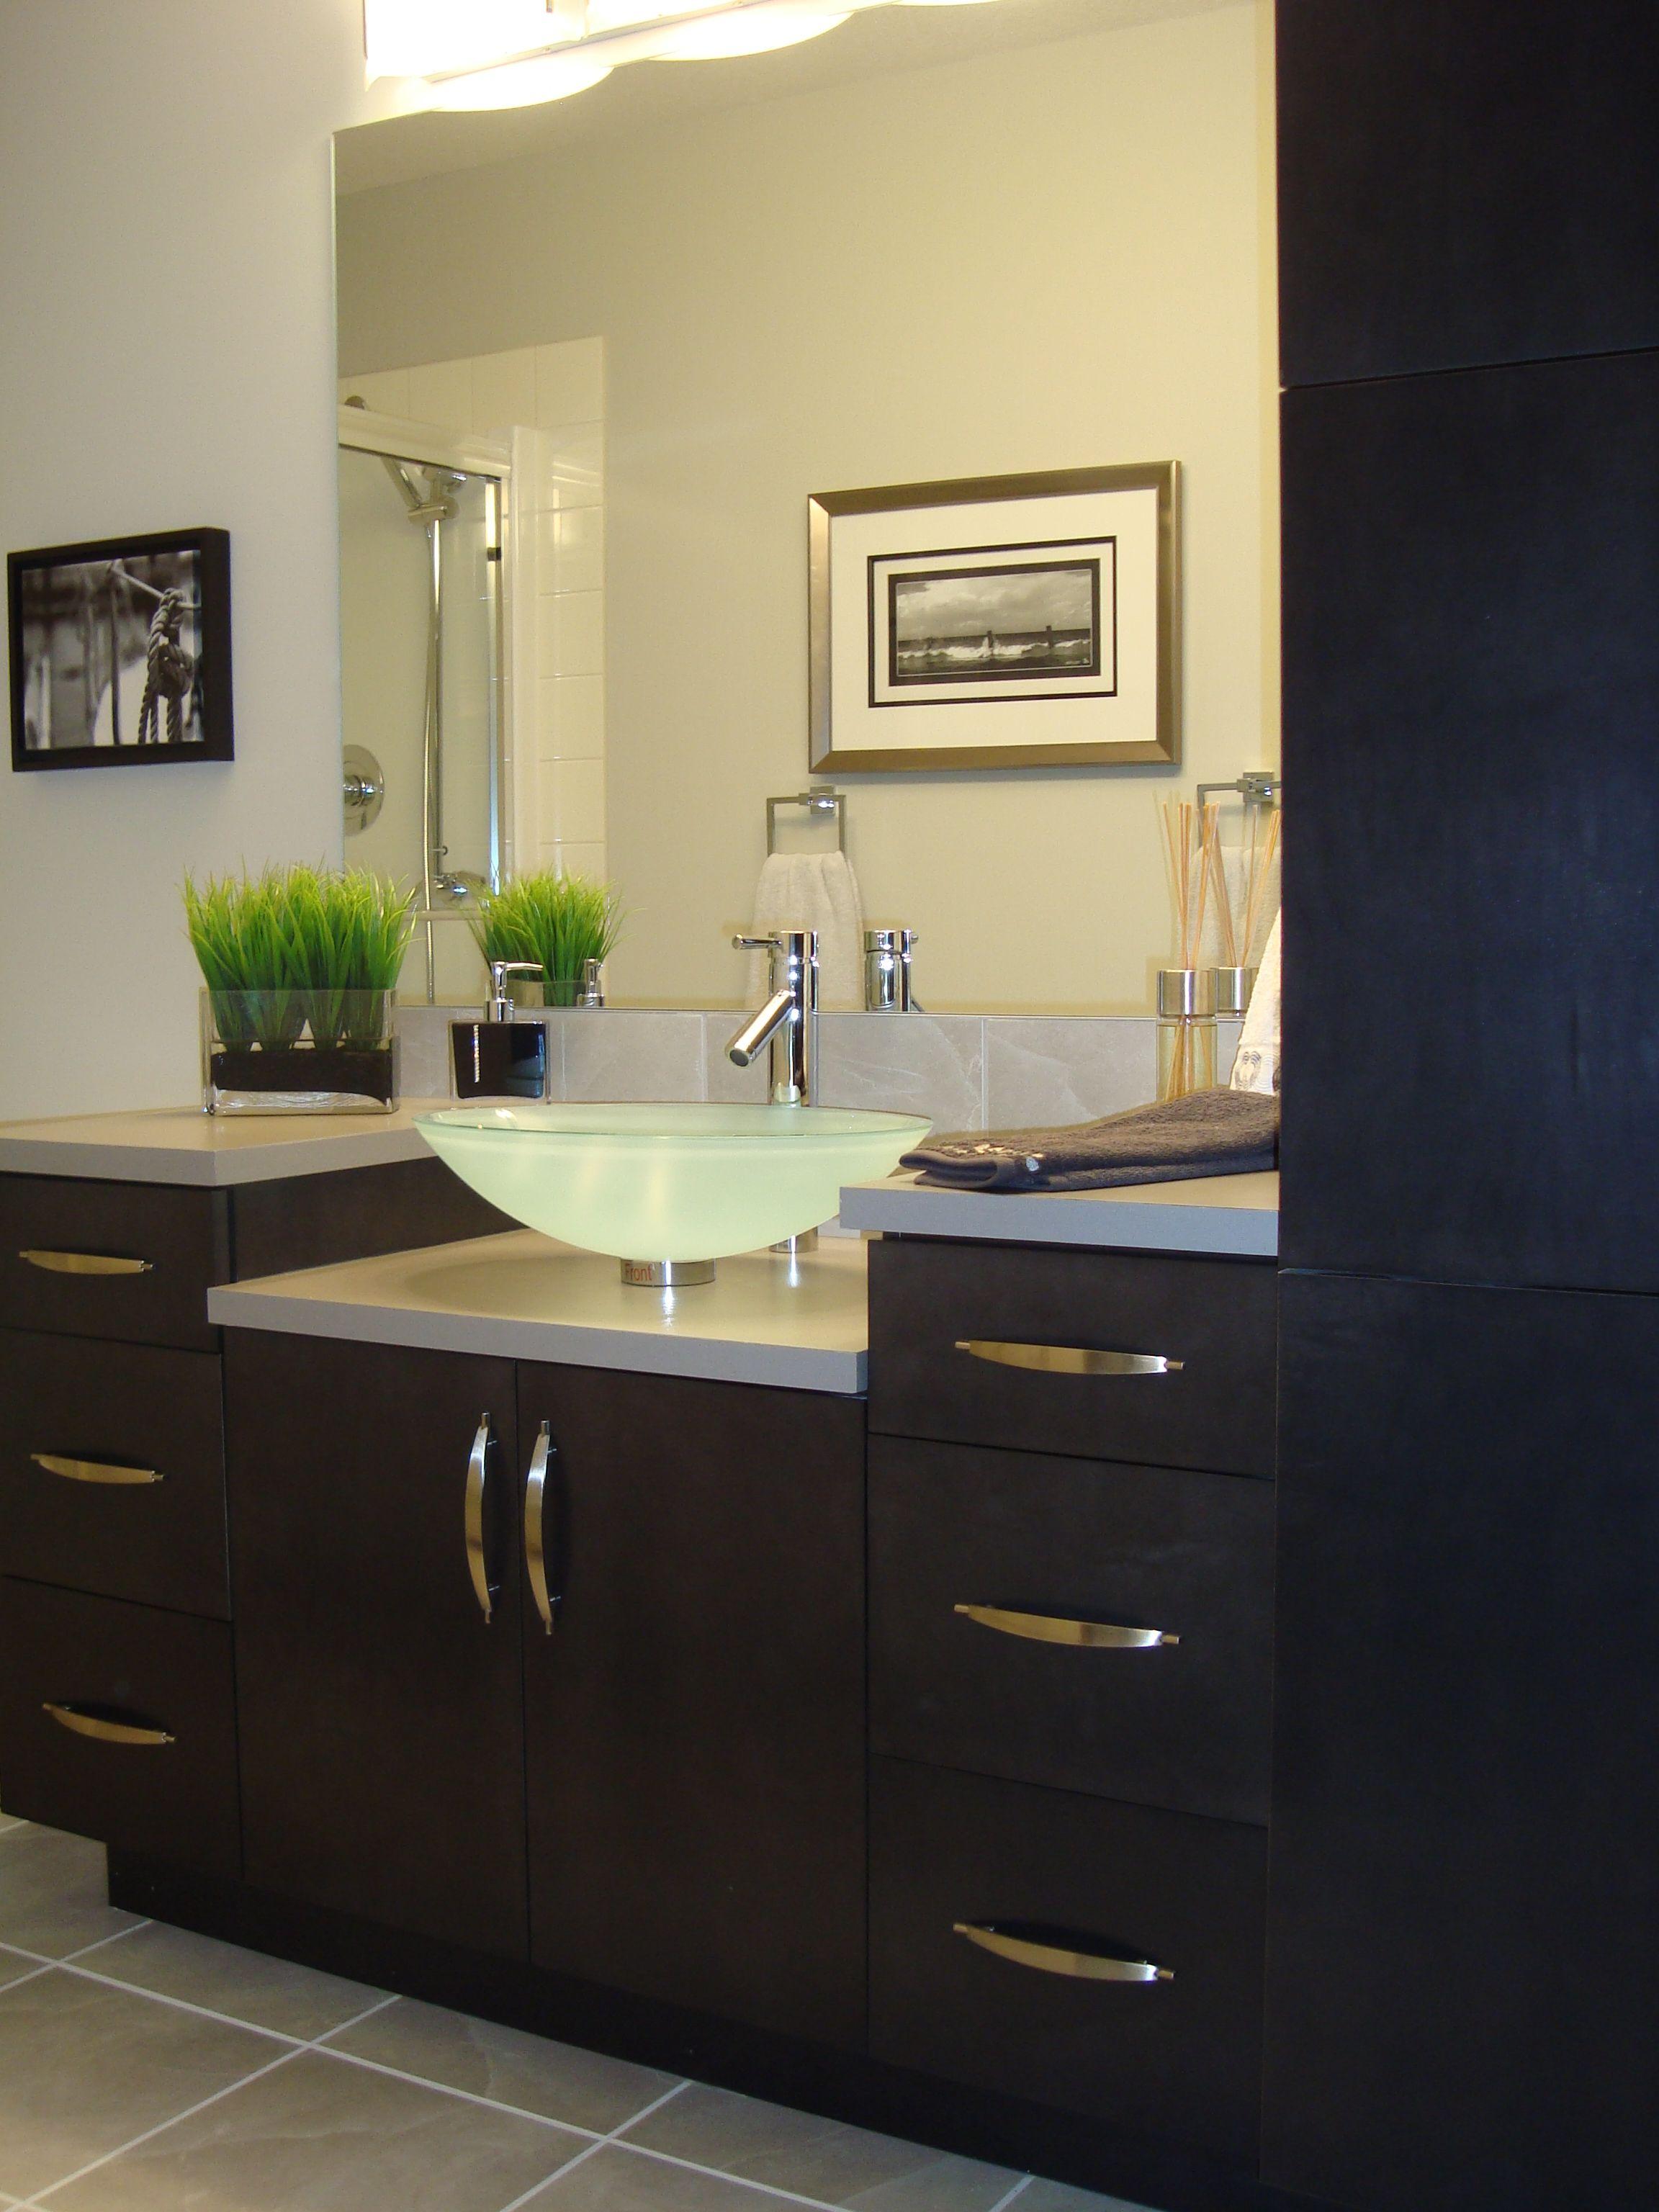 Bathroom Accessories Edmonton Alberta edmonton, alberta in alberta | jan 2015 | pinterest